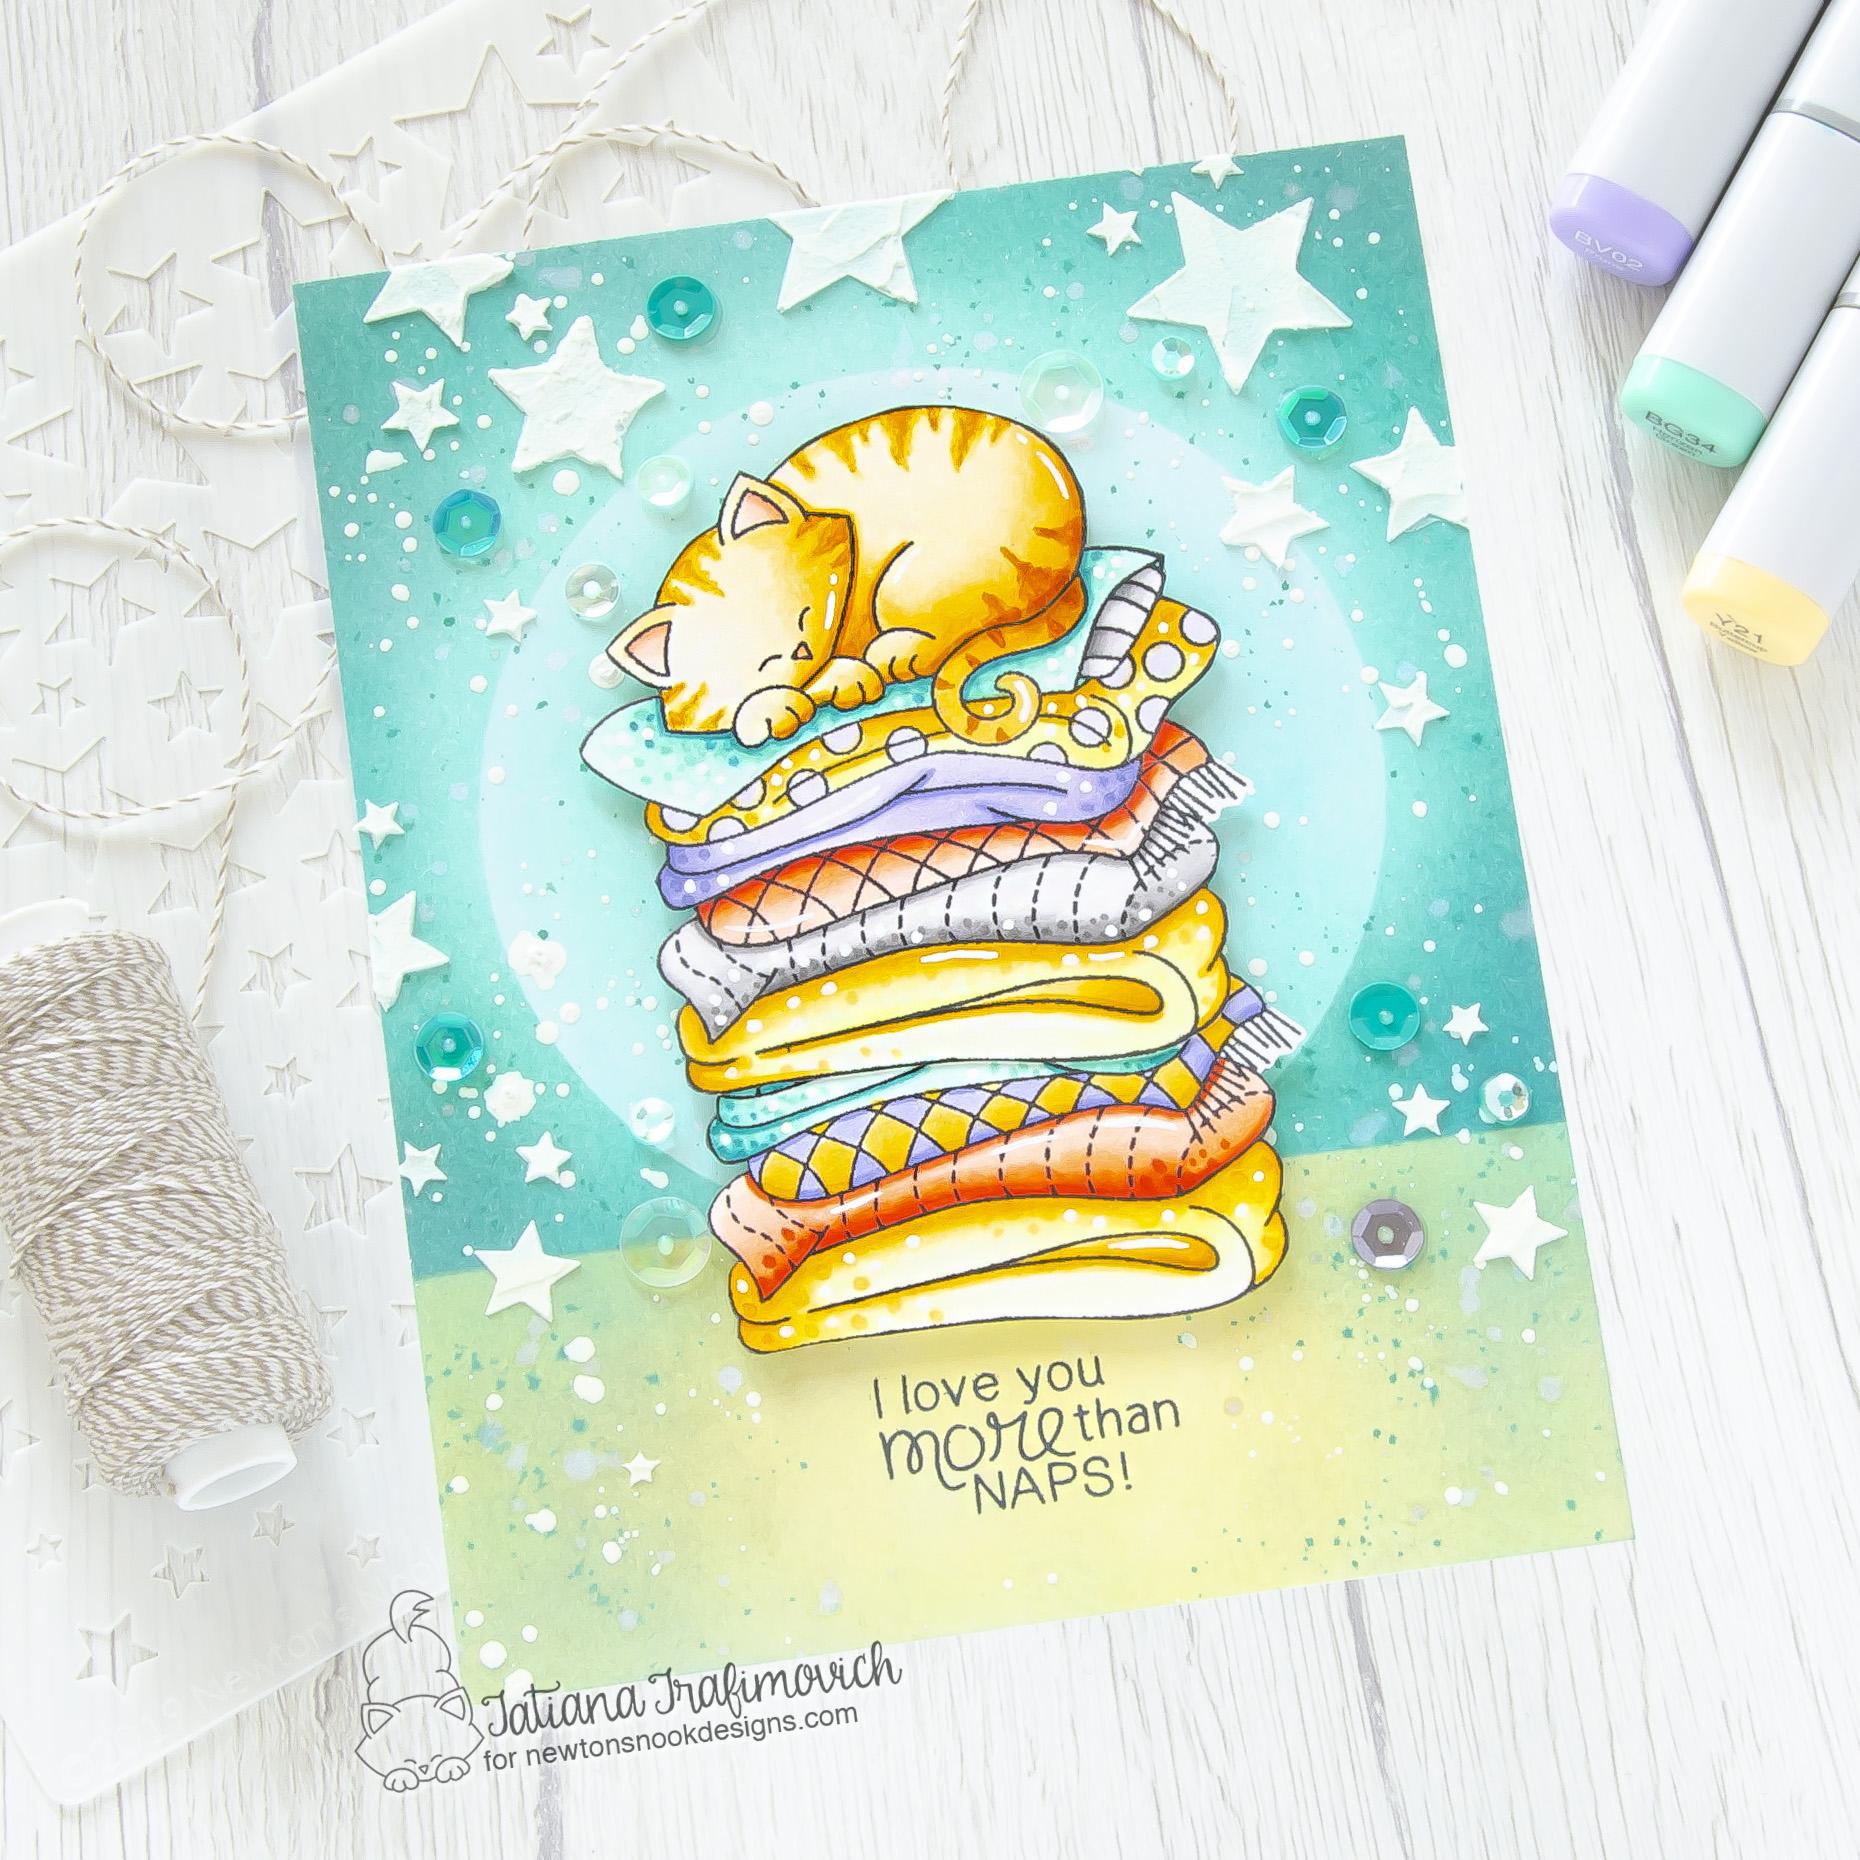 I Love You More Than Naps #handmade card by Tatiana Trafimovich #tatianacraftandart - Newton's Naptime stamp set by Newton's Nook Designs #newtonsnook